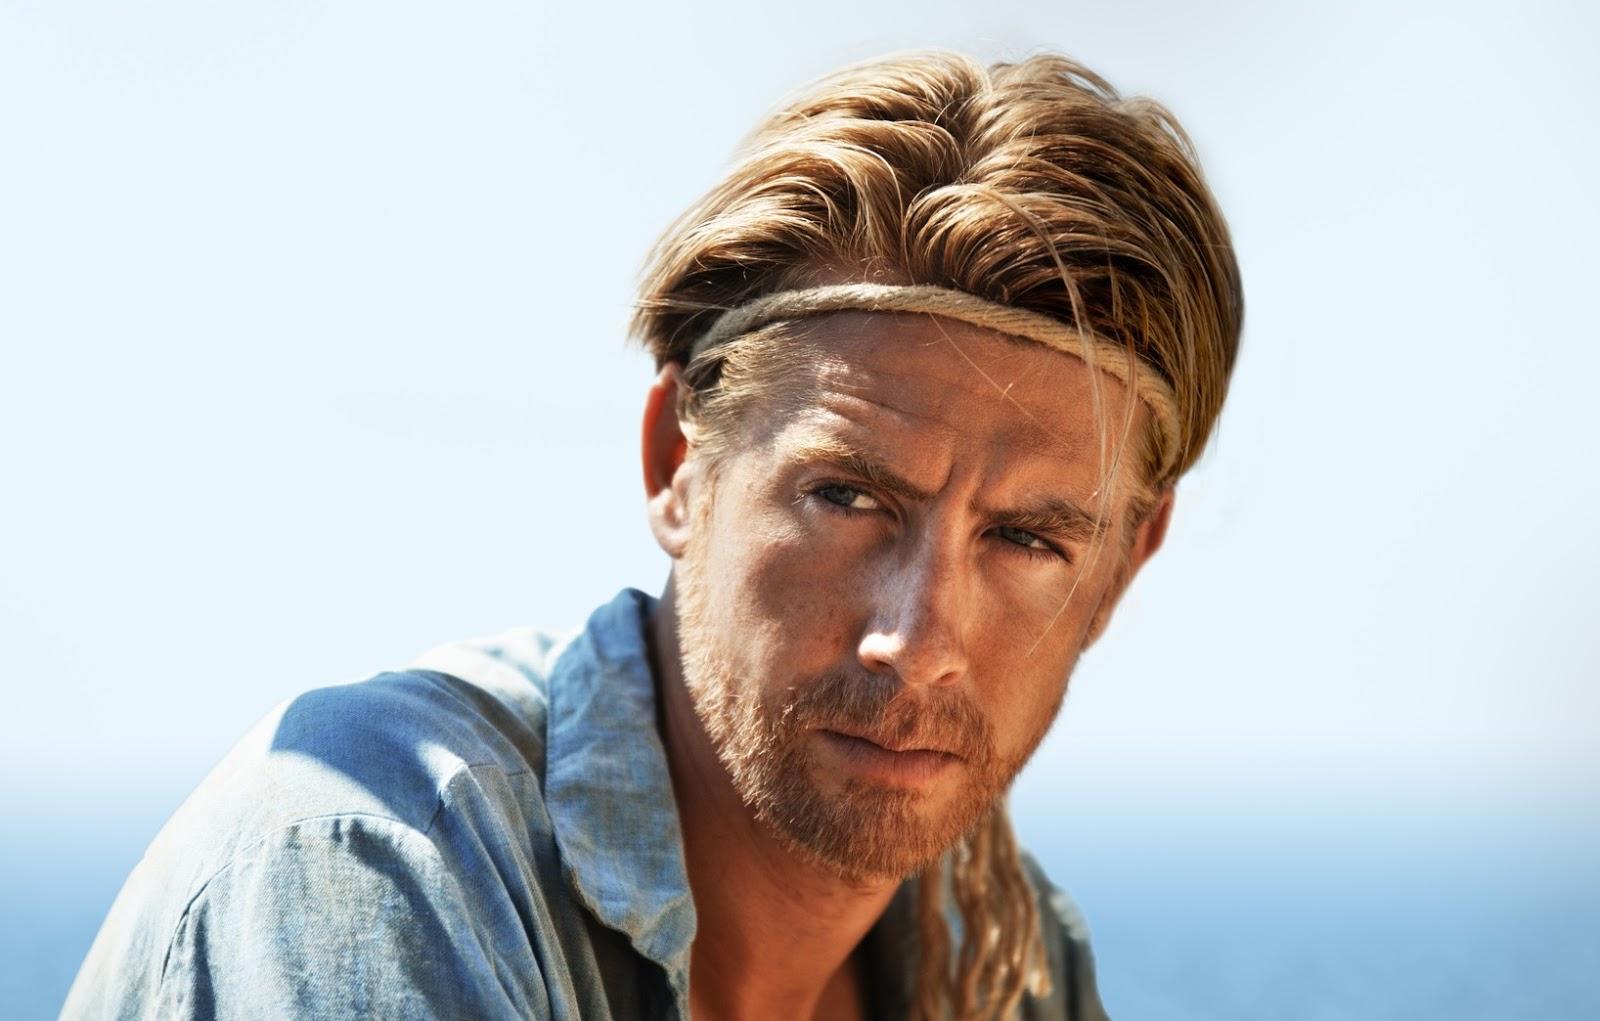 Thor Heyerdahl (Pål Sverre Valheim Hagen)